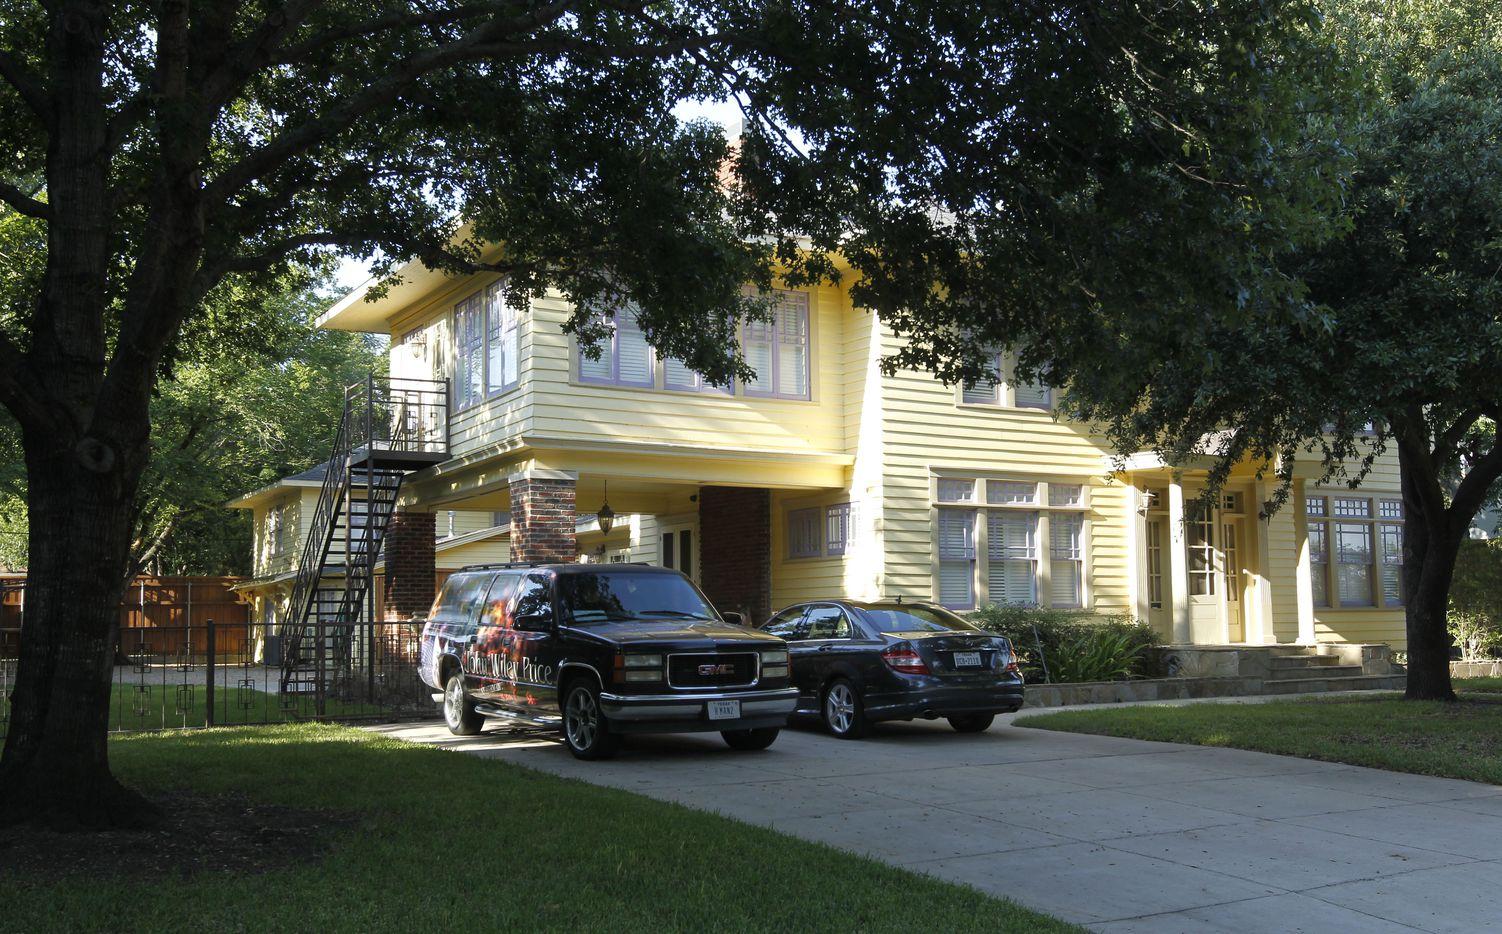 The home of Dallas County Commissioner John Wiley Price is in the Oak Cliff area of Dallas.